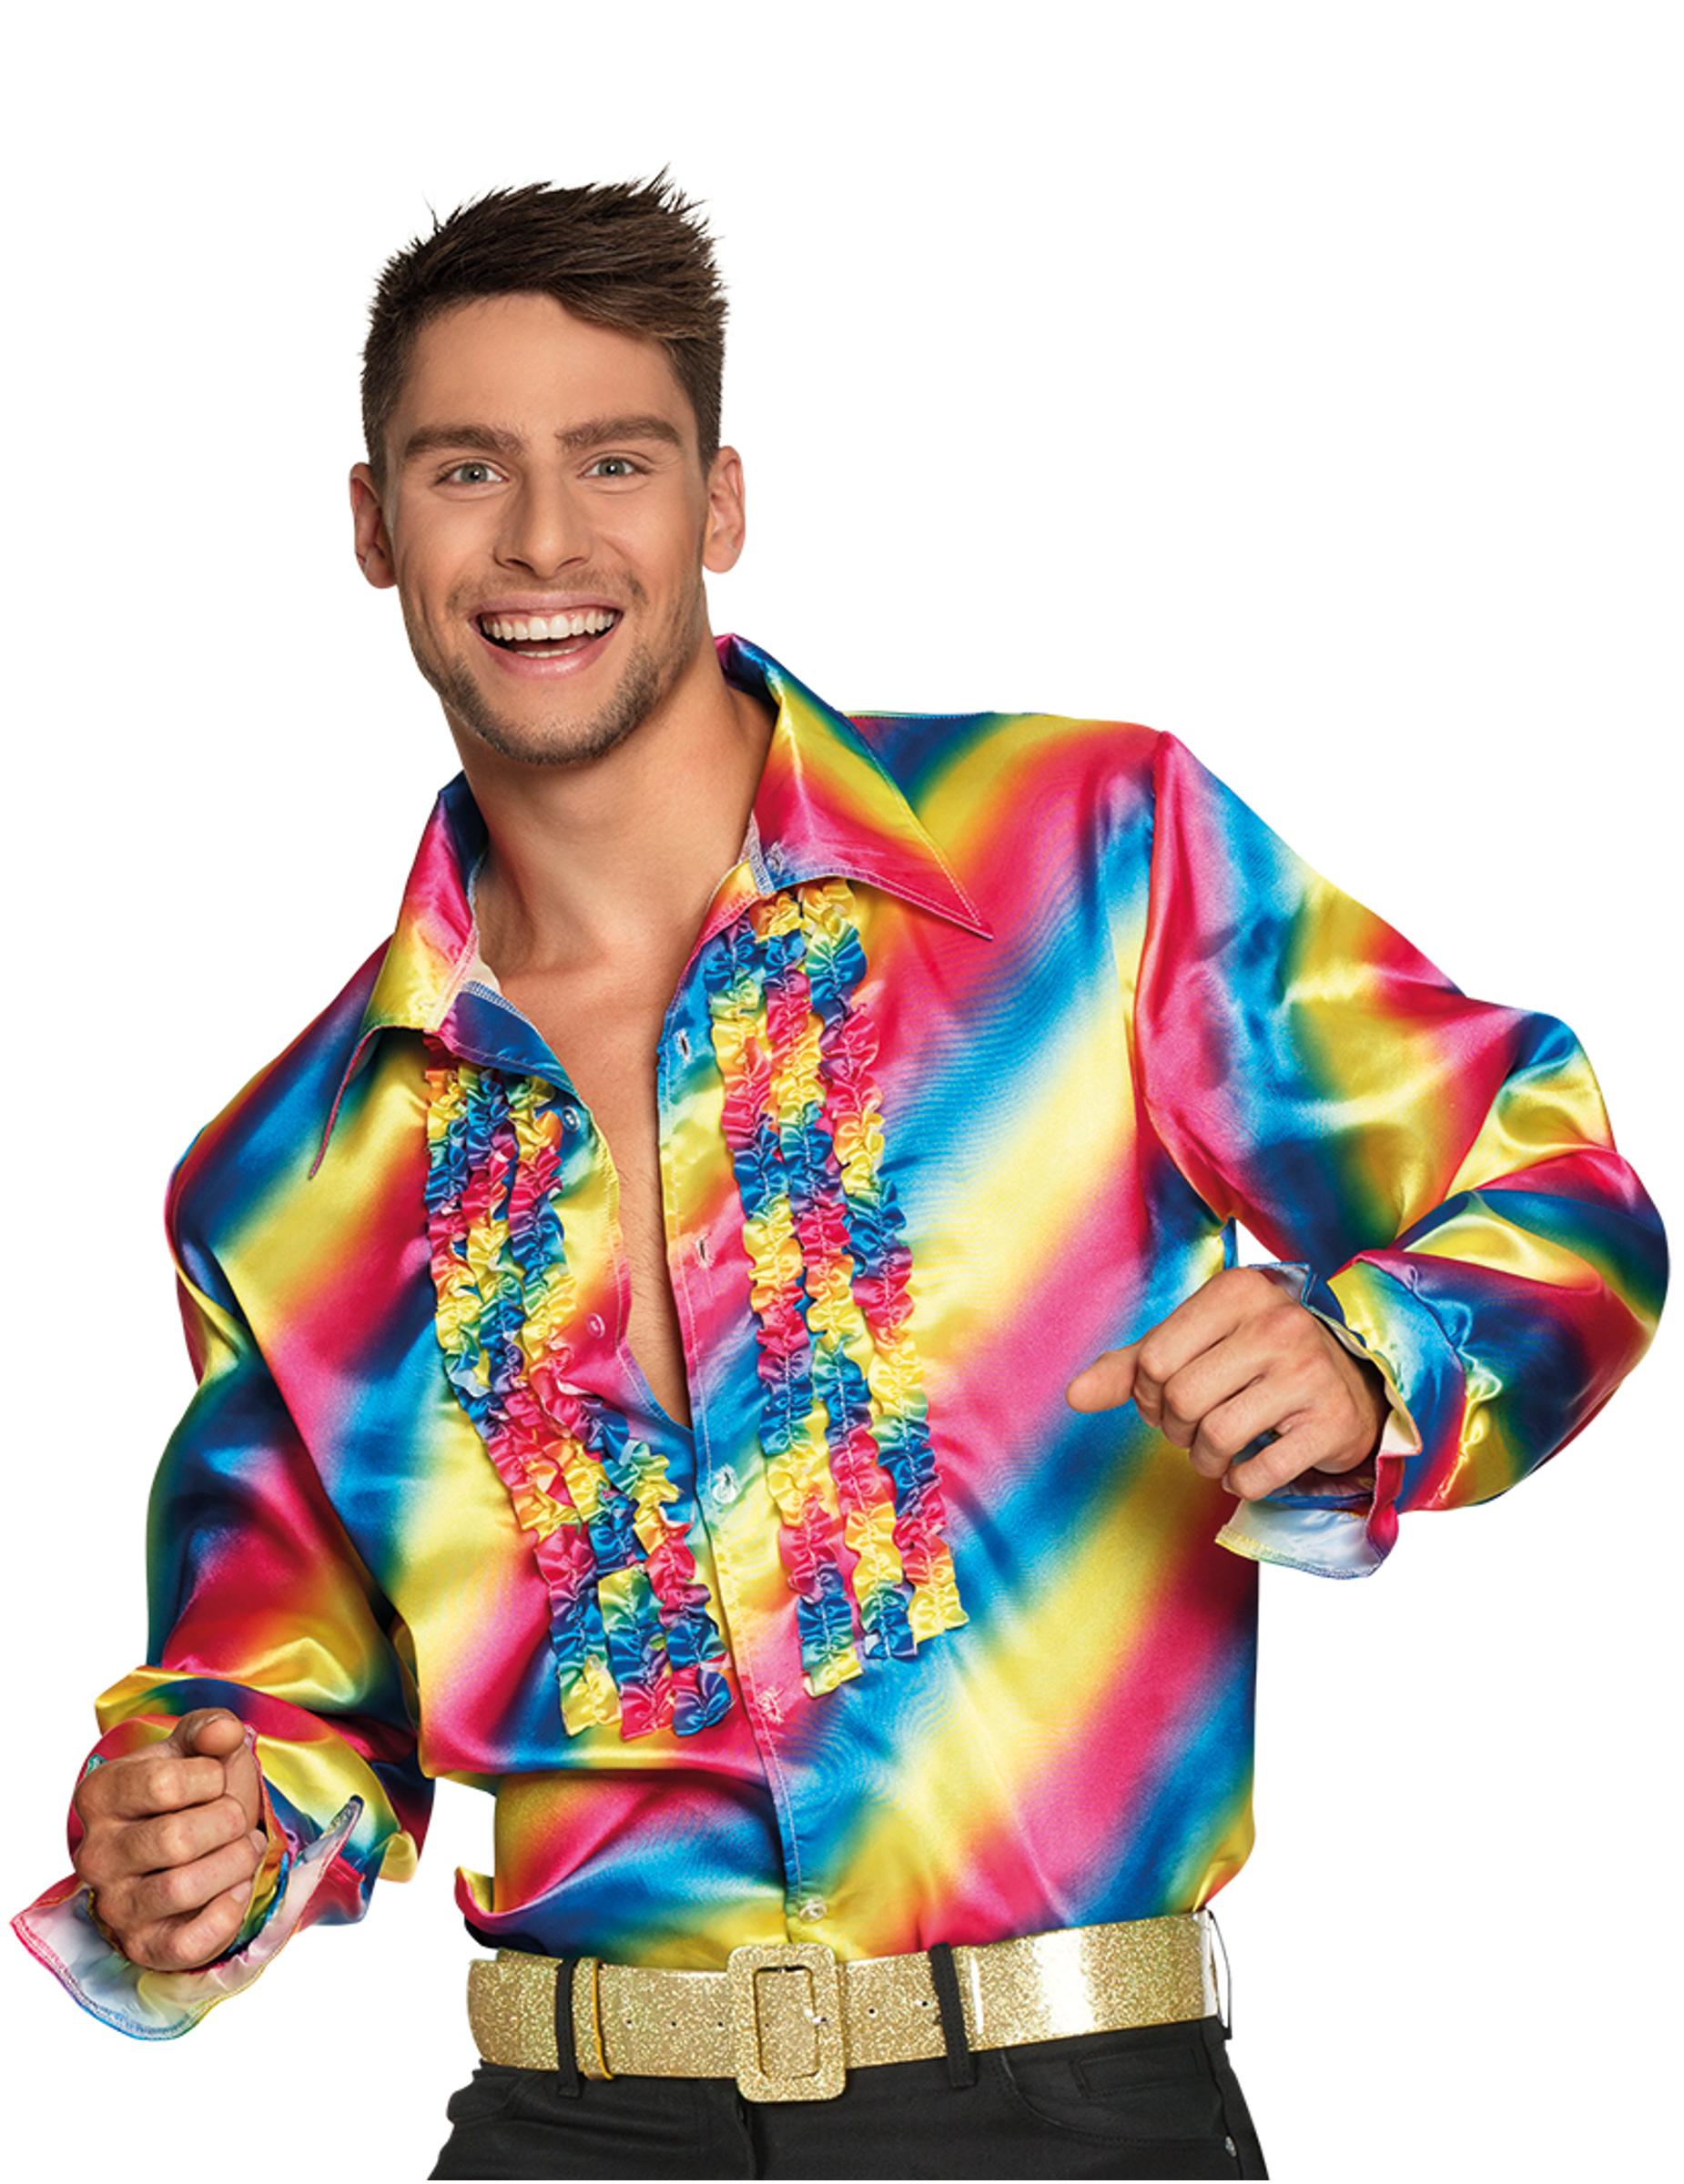 89ed0115cfc Skjorte disco regnbue til voksne, køb Kostumer til voksne på Vegaoo.dk